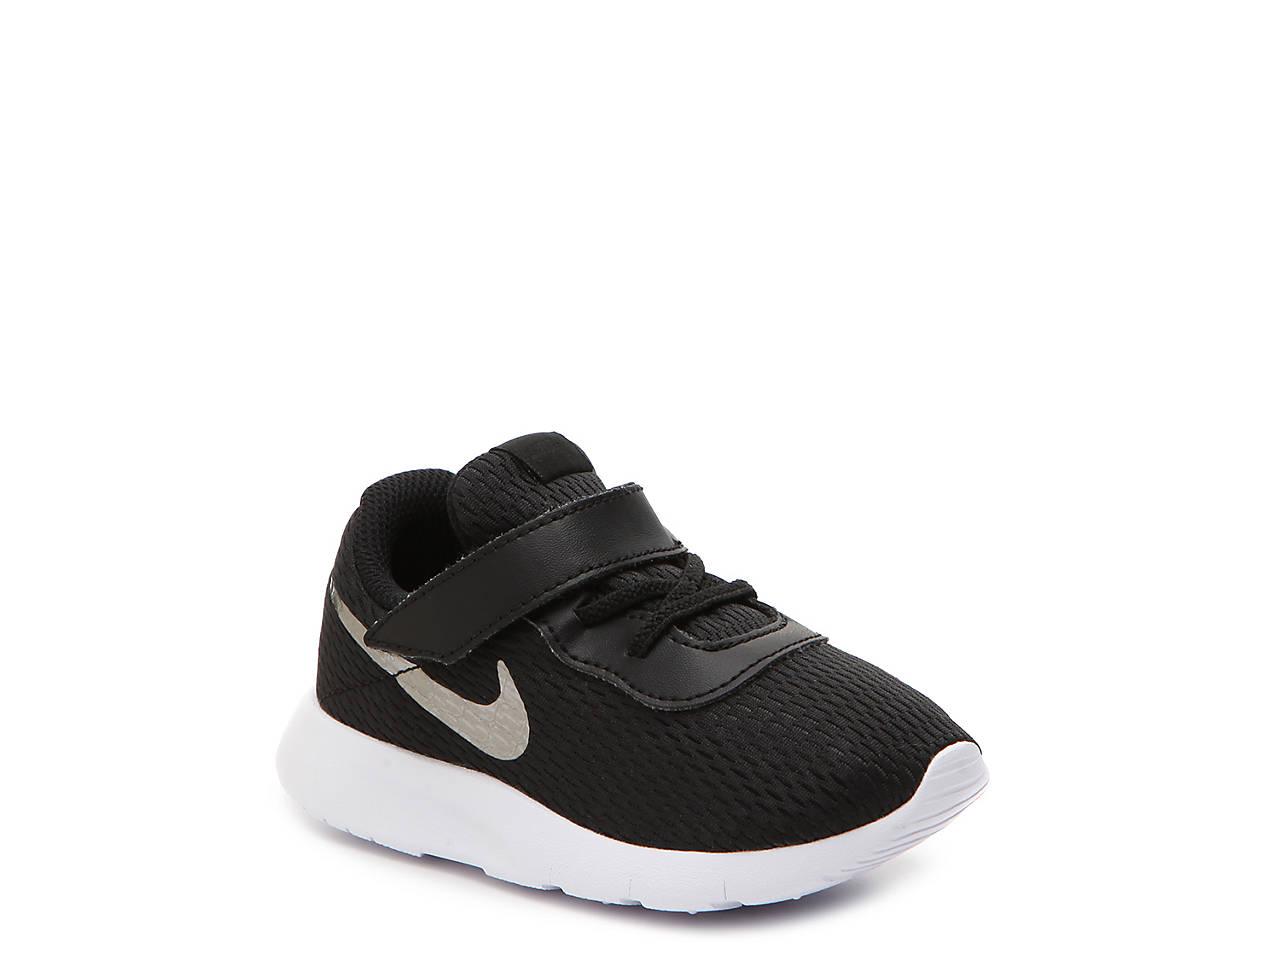 65843da9fda30 Nike Tanjun Toddler Sneaker Kids Shoes